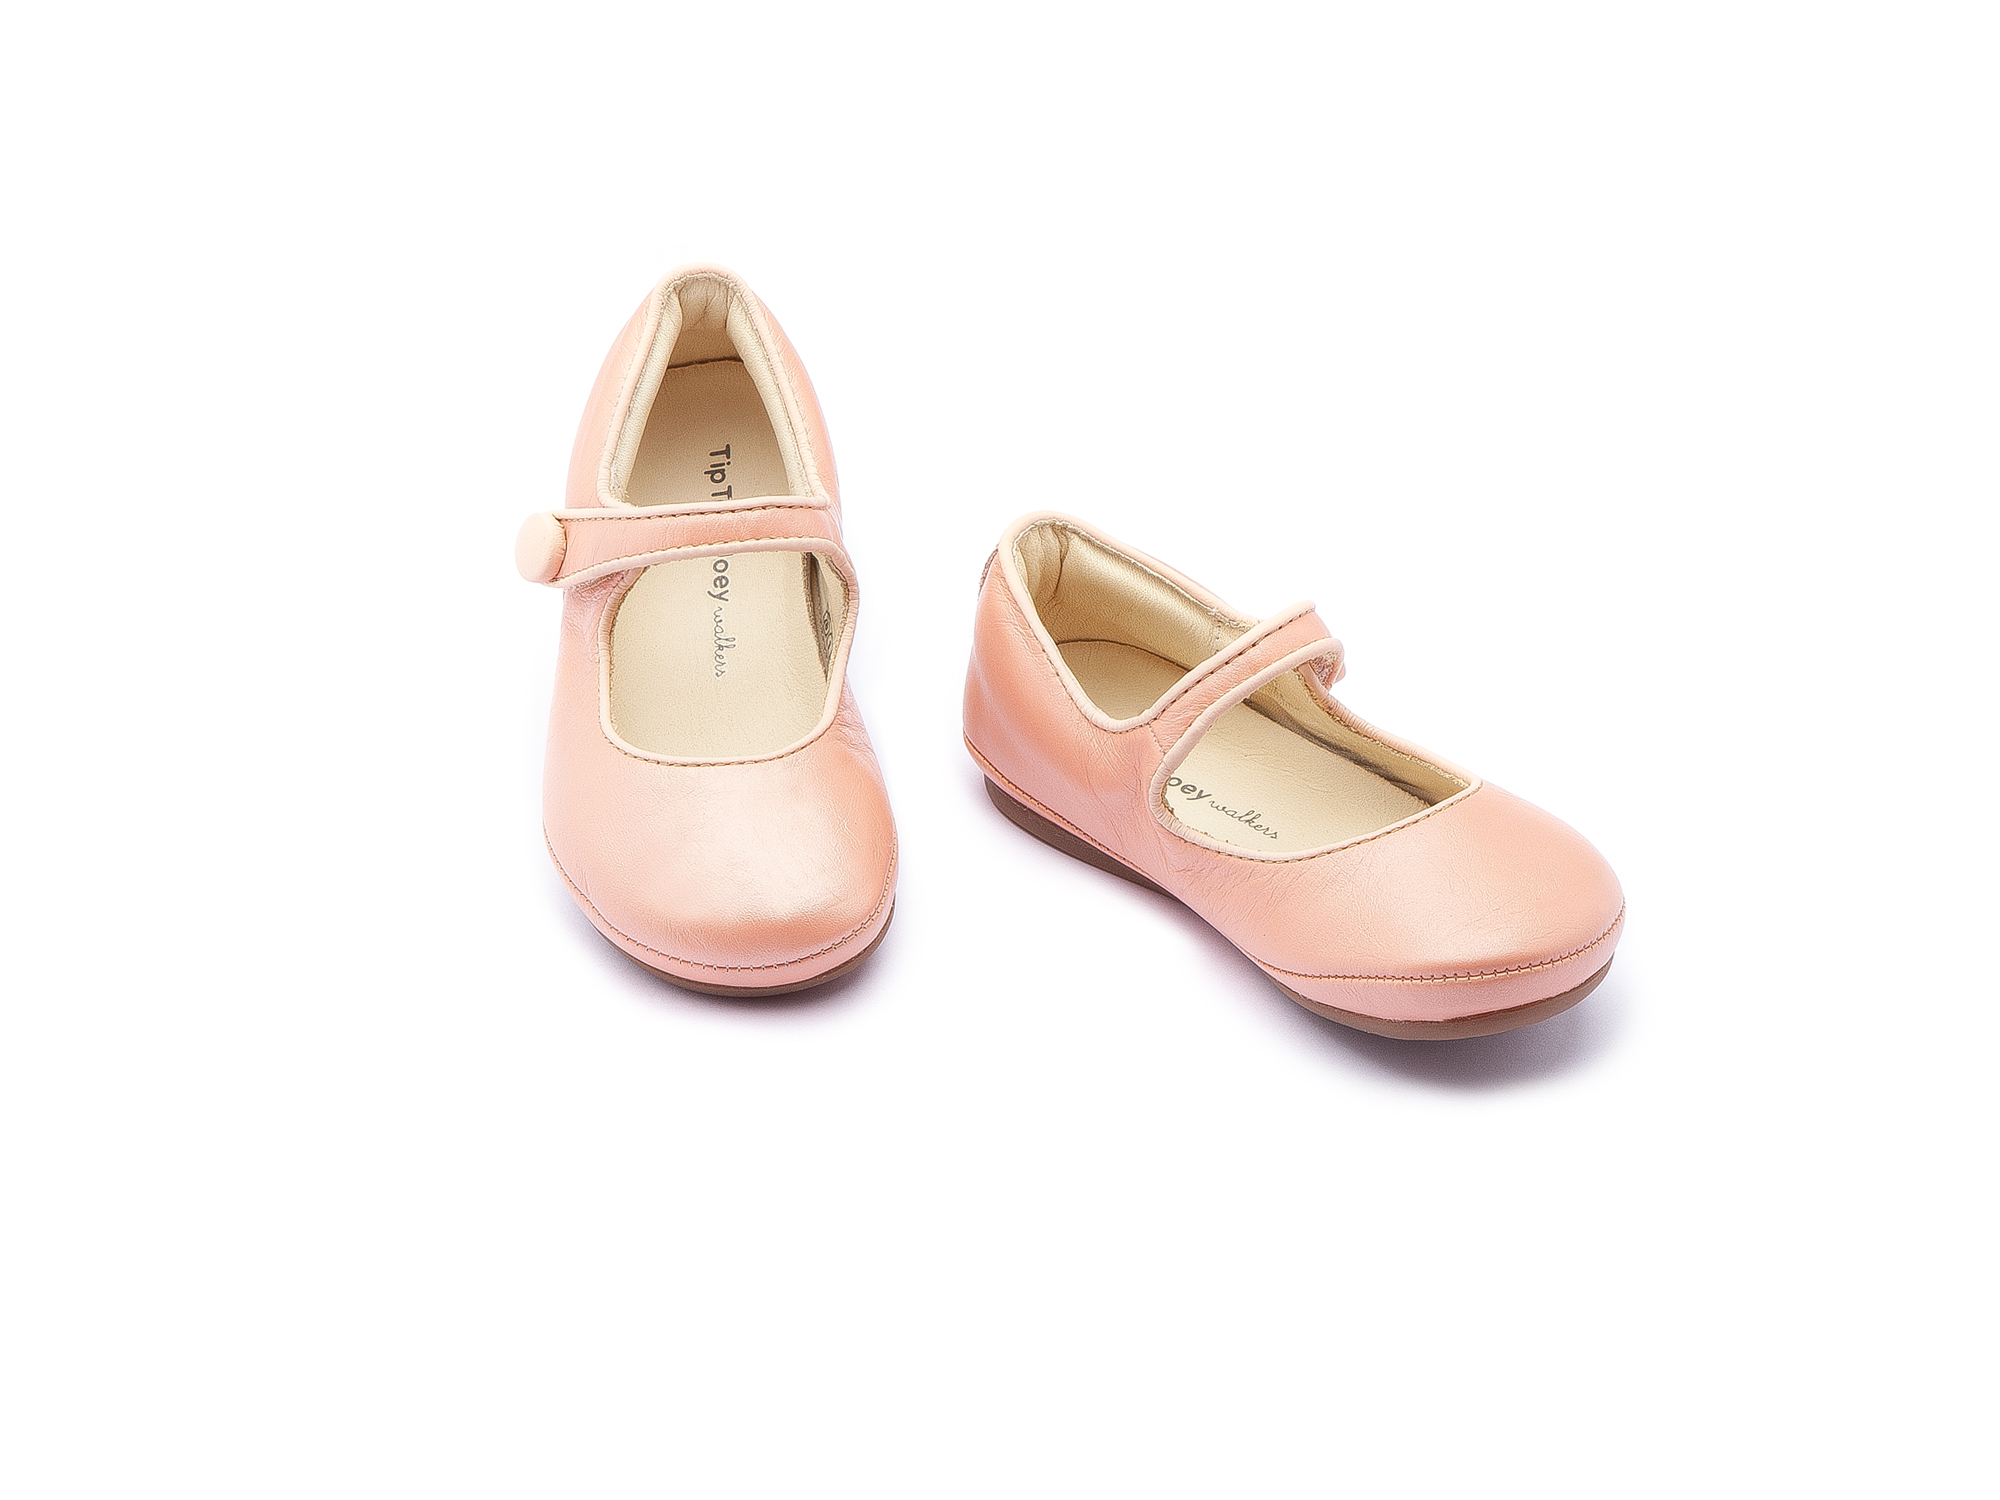 Boneca Little Gavotte Flamingo/ Papaya Cream Toddler 2 à 4 anos - 2